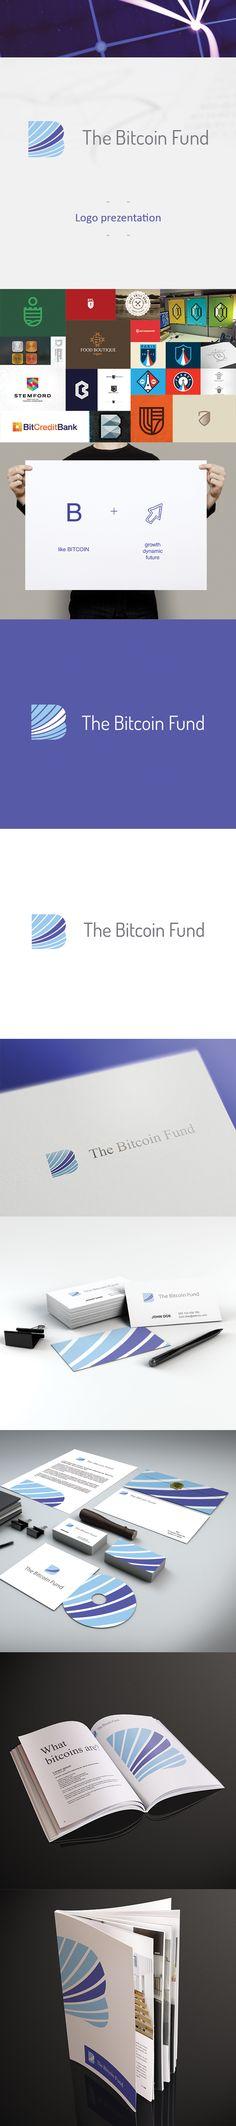 TBF logo 1 by Elastika, via Behance